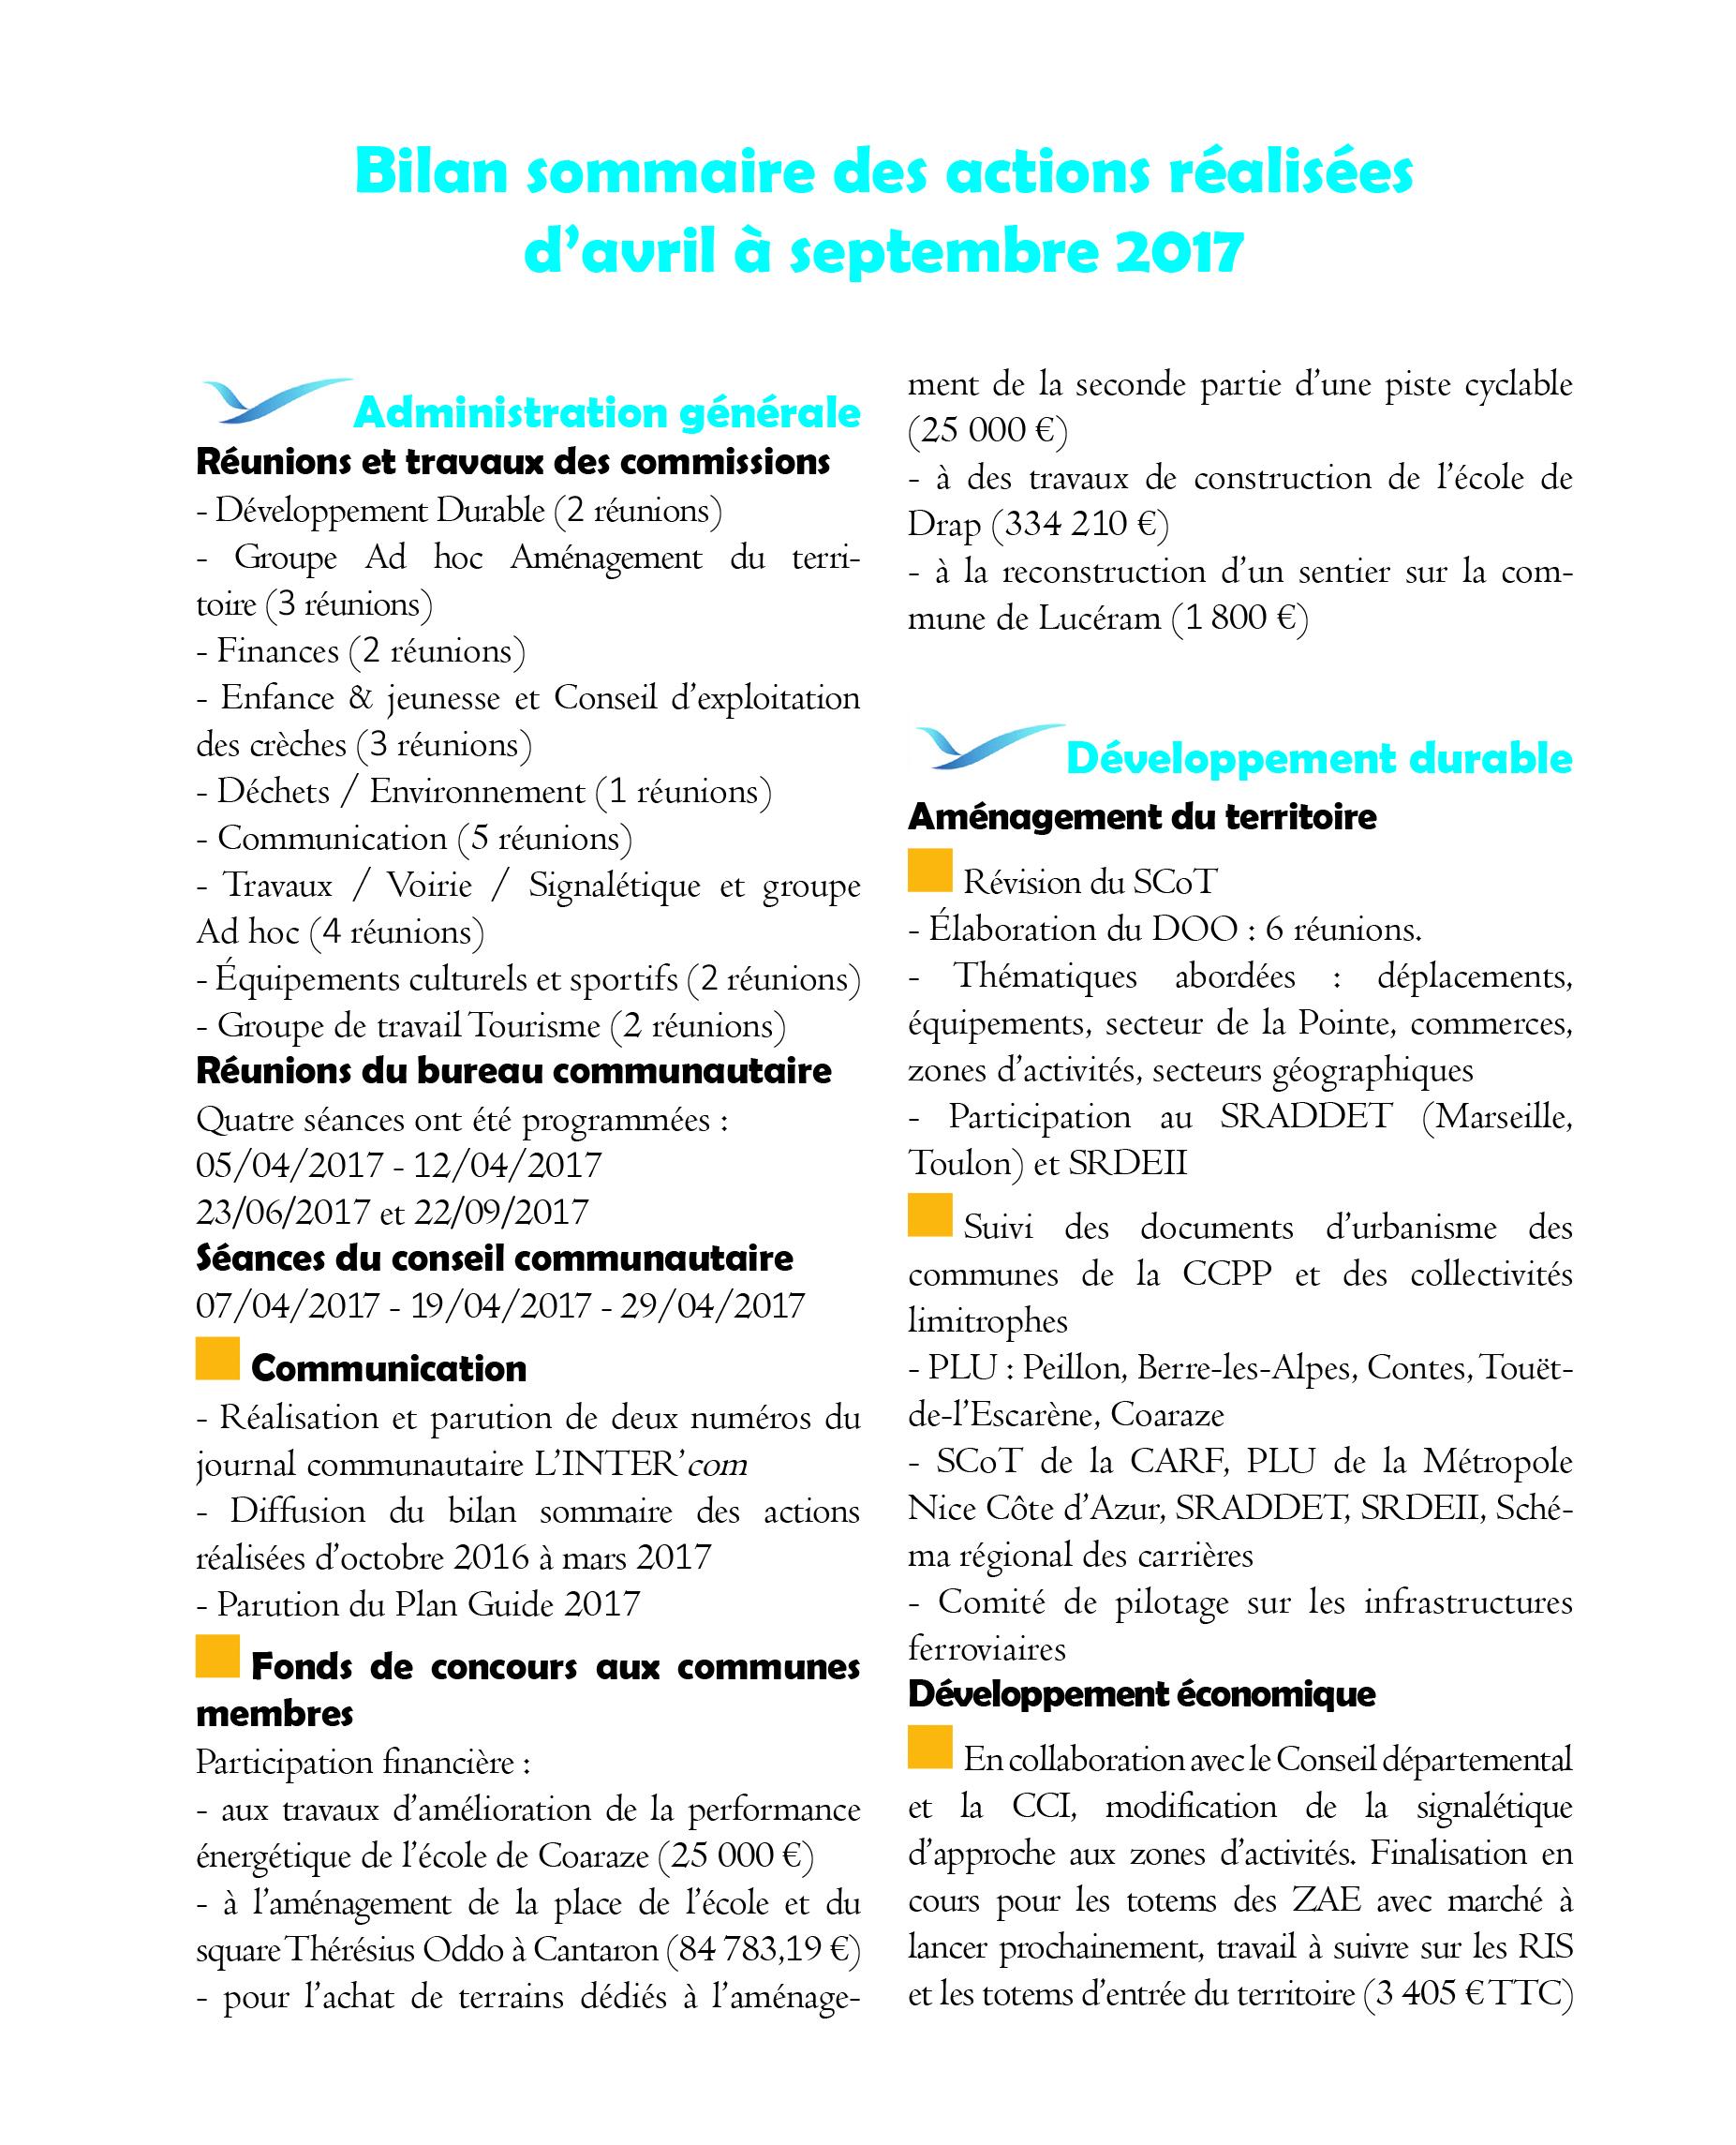 Vignette Bilan d'avril septembre 2017-1